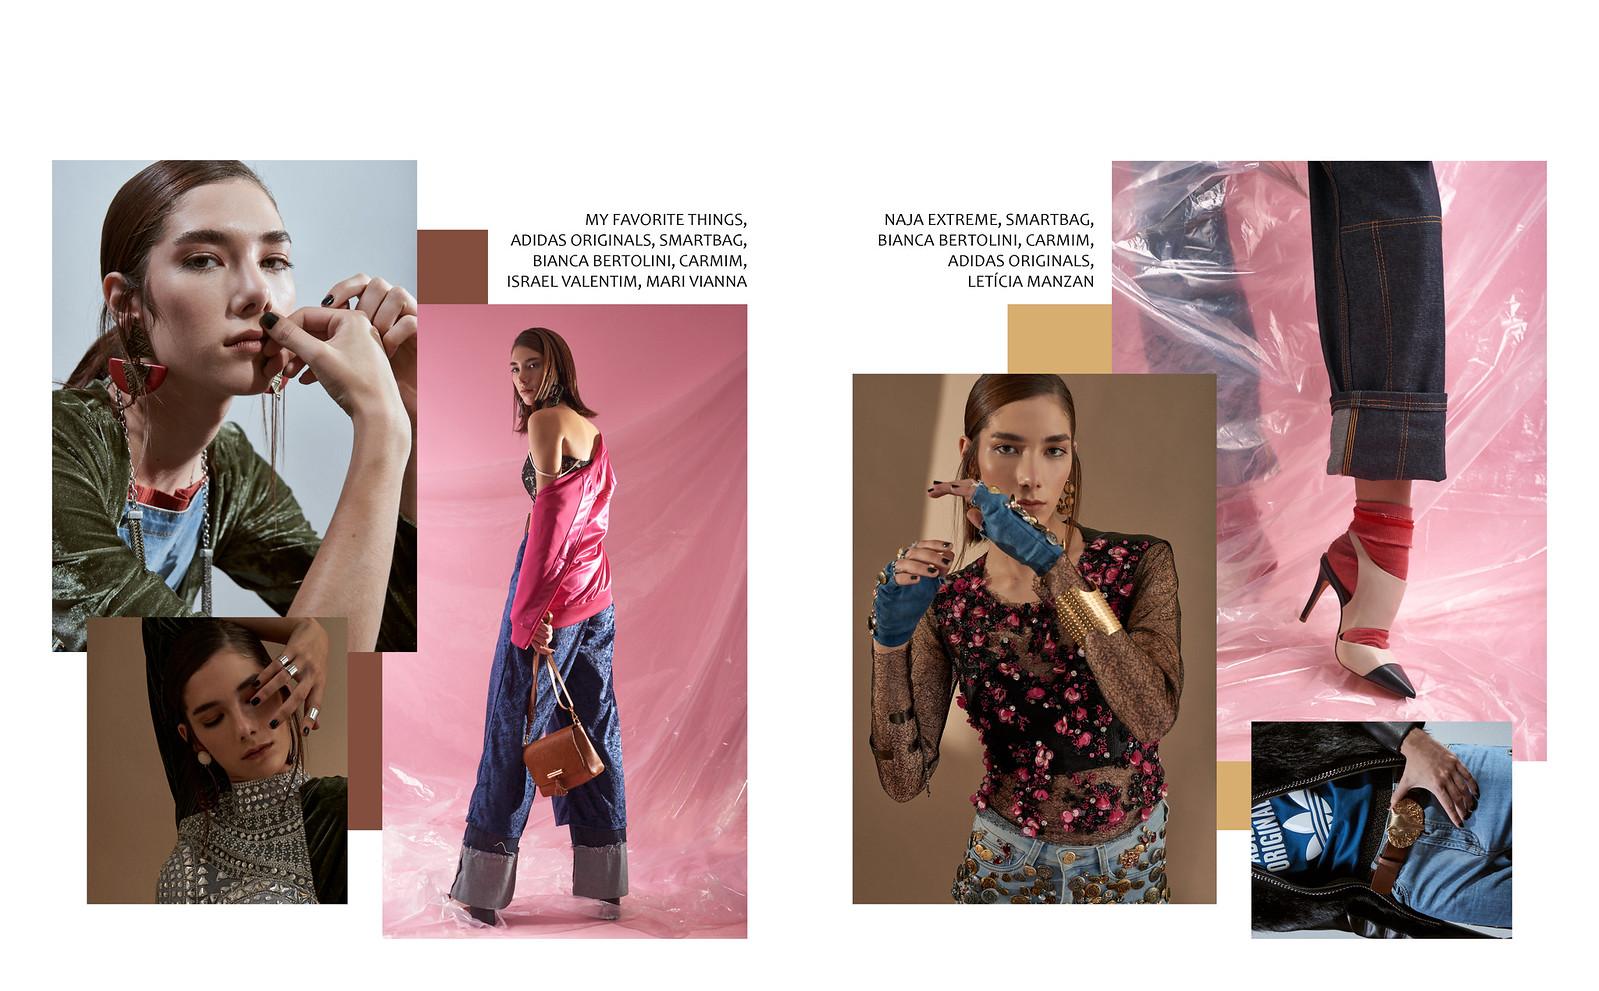 BRRUN.com, BRRUNzine, Moda, Fashion, Editorial, Renato Machry, Bruno Capasso, Tiago Gomes, Teo Miranda, Malu Bortolini, Mega Model Brasil, Francisco Rosatelli, Hermes Renato Fonseca